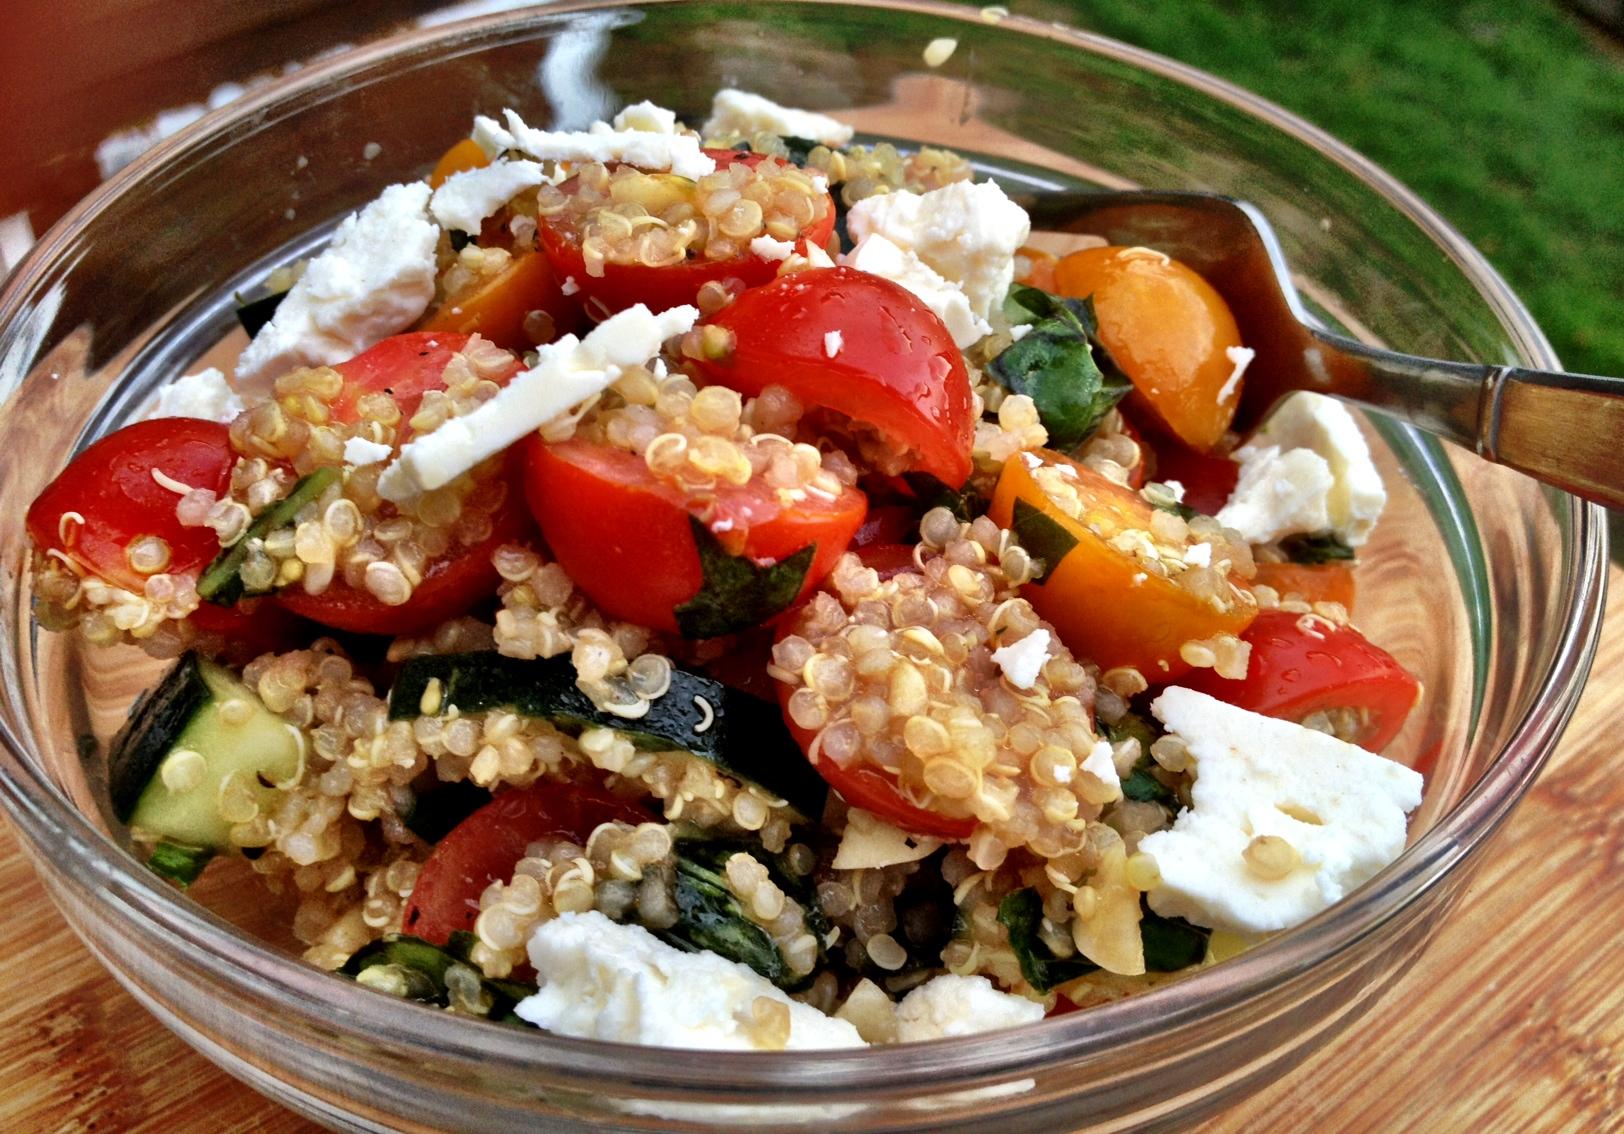 summer quinoa salad - Dishing Up the Dirt